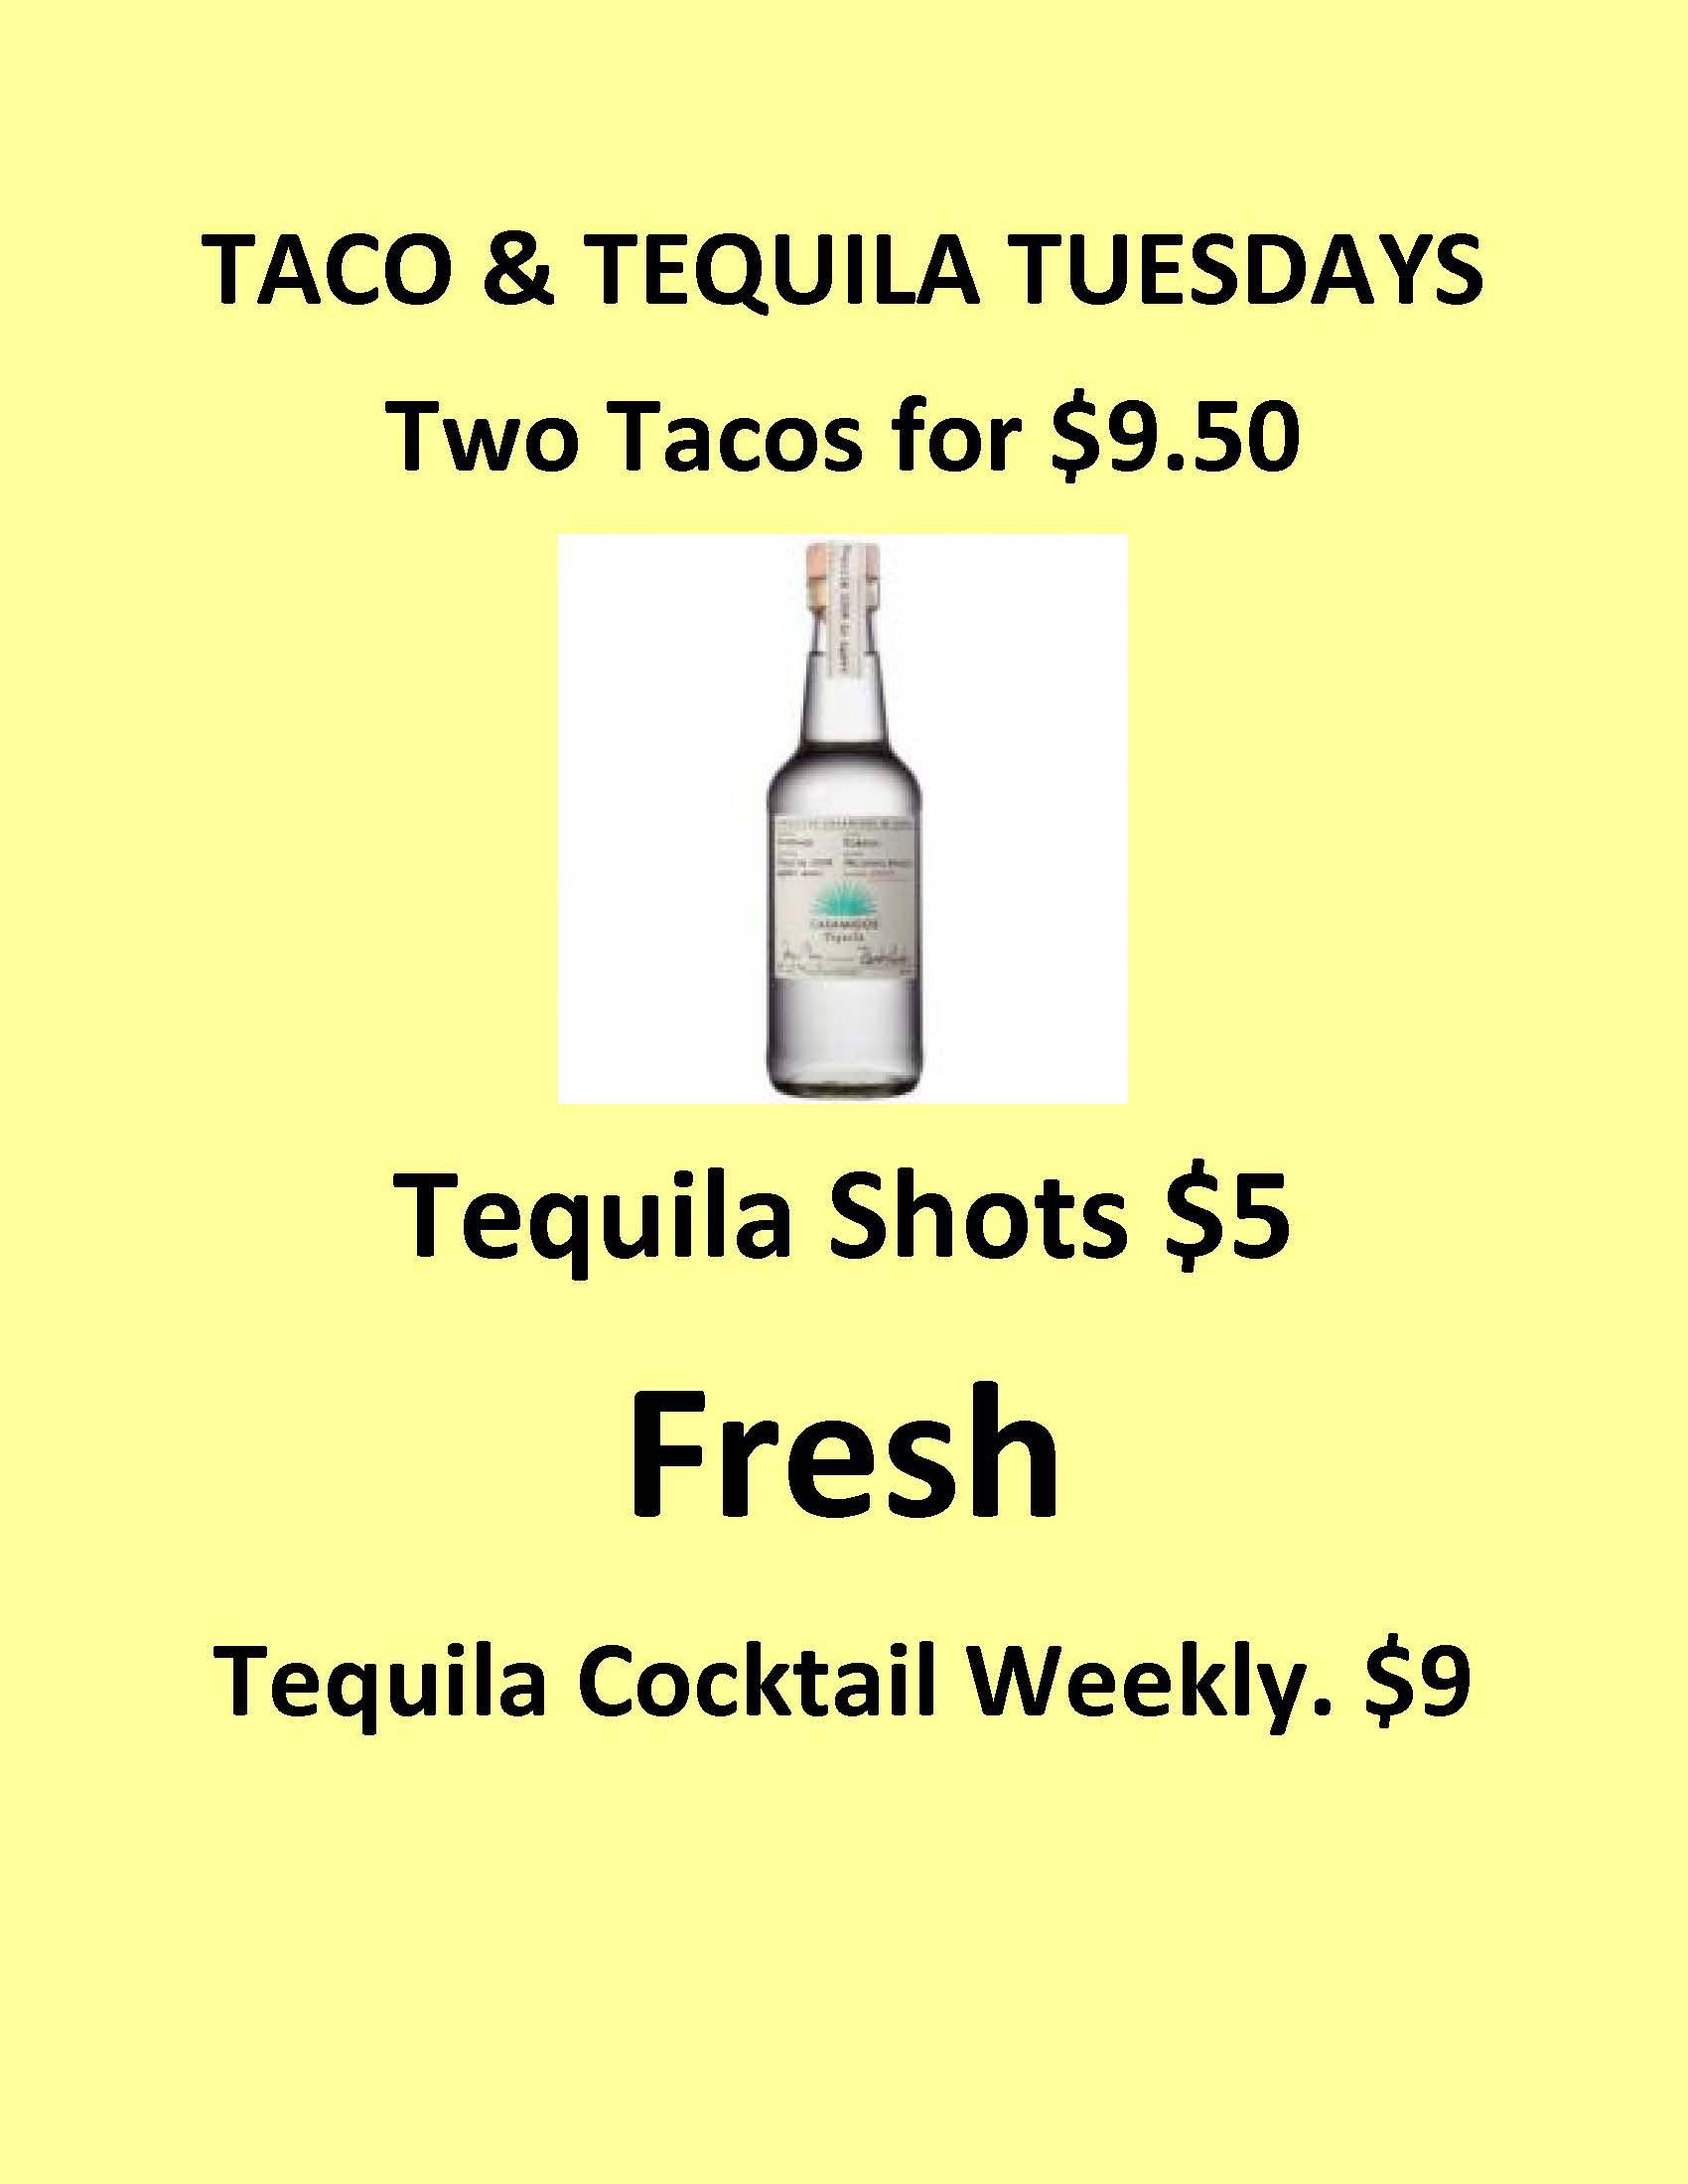 TACO&TEQUILA TUESDAYS.jpg